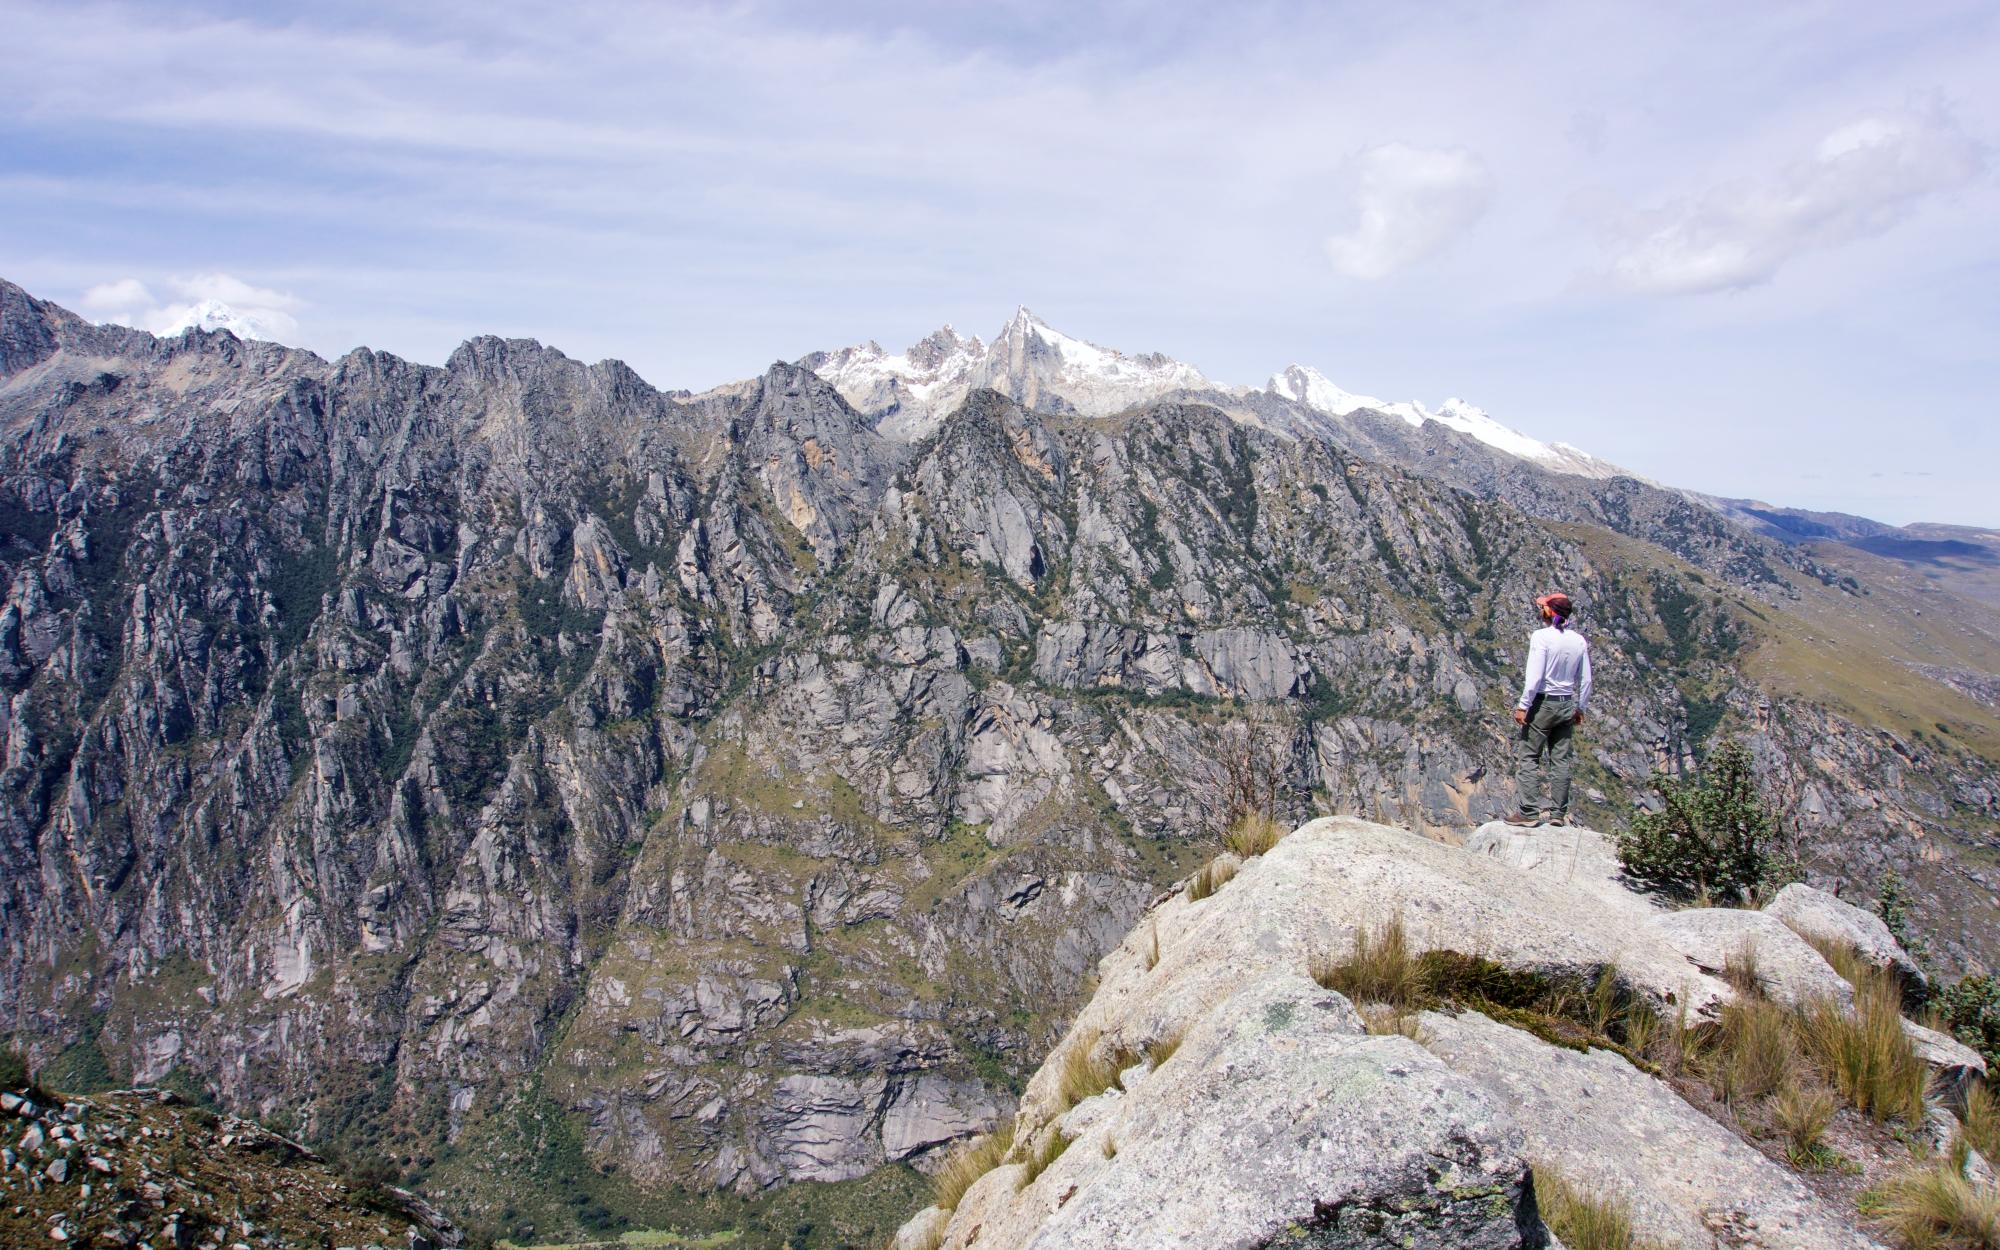 Guido, a mountain guide from Casa de Guias overlooking the incredible landscape.